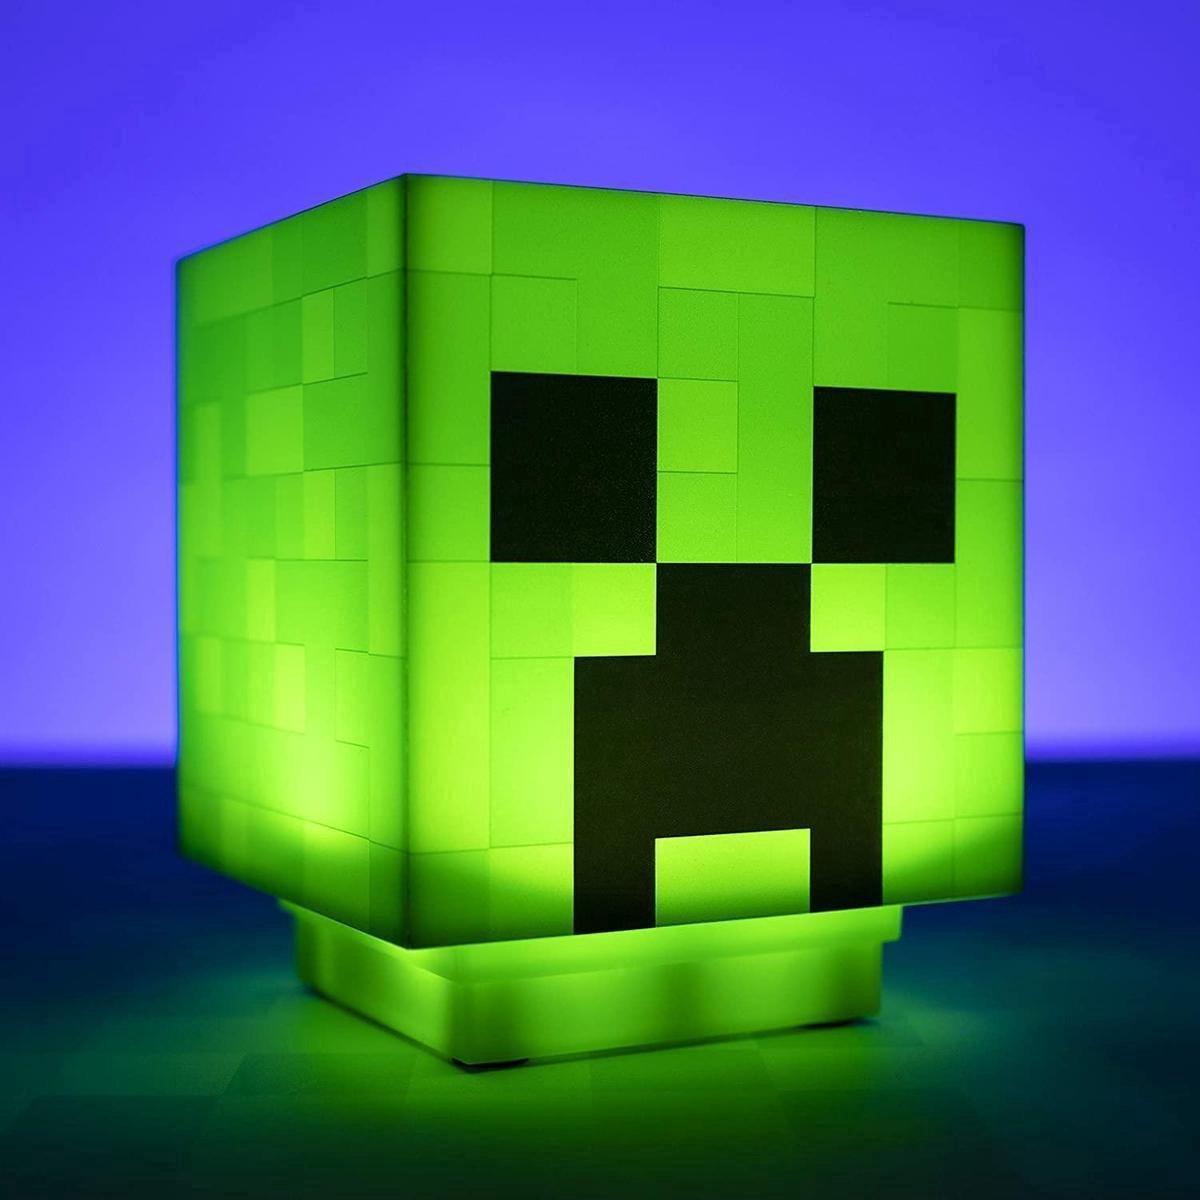 Minecraft Creeper Lamp met geluid